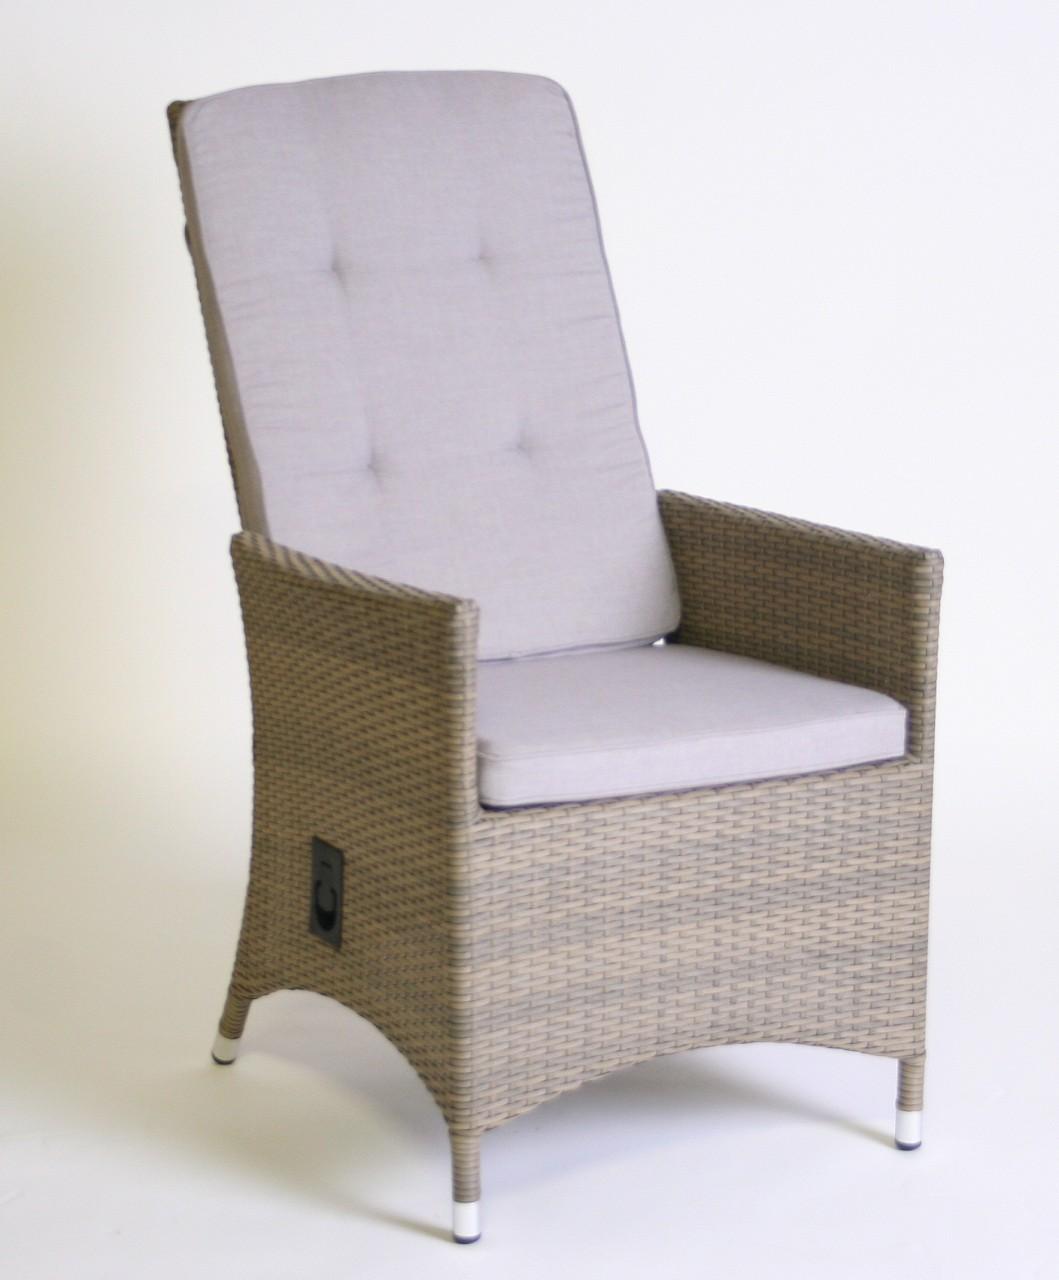 hochlehner throne relaxer inkl polster gartensessel rattan braun beige verstellbare. Black Bedroom Furniture Sets. Home Design Ideas